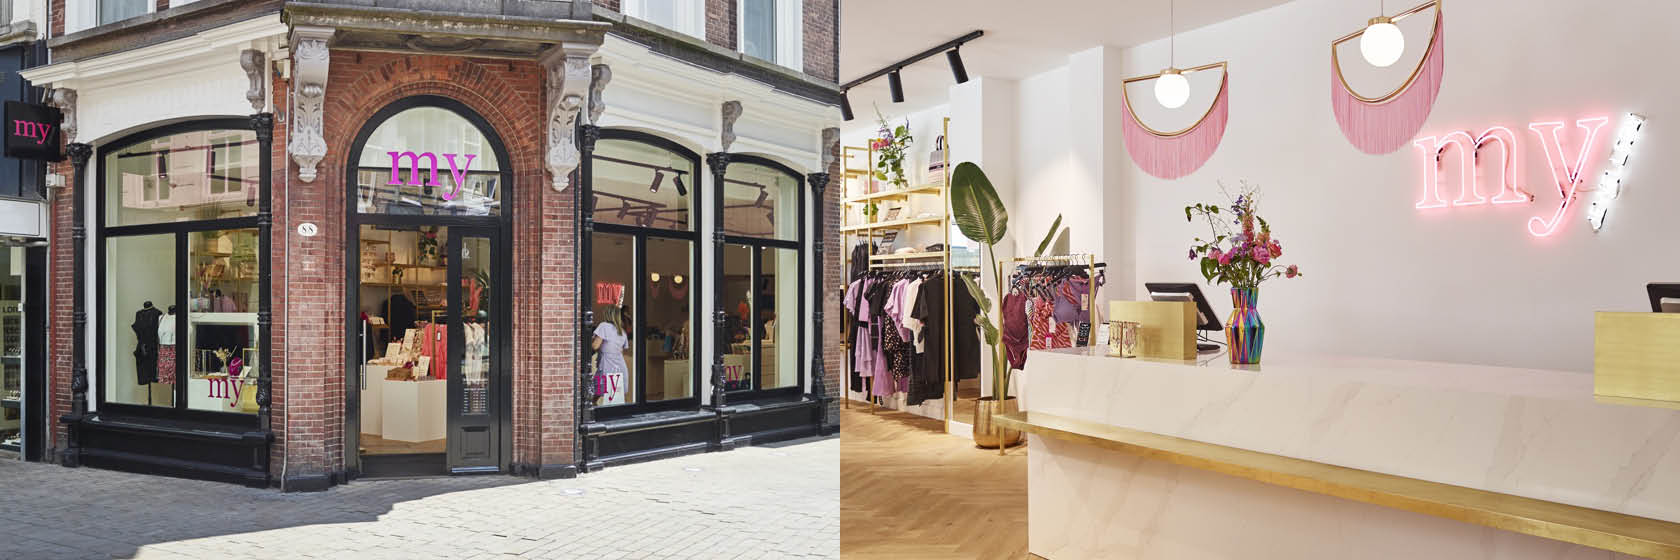 My Jewellery boutique Nijmegen coming soon